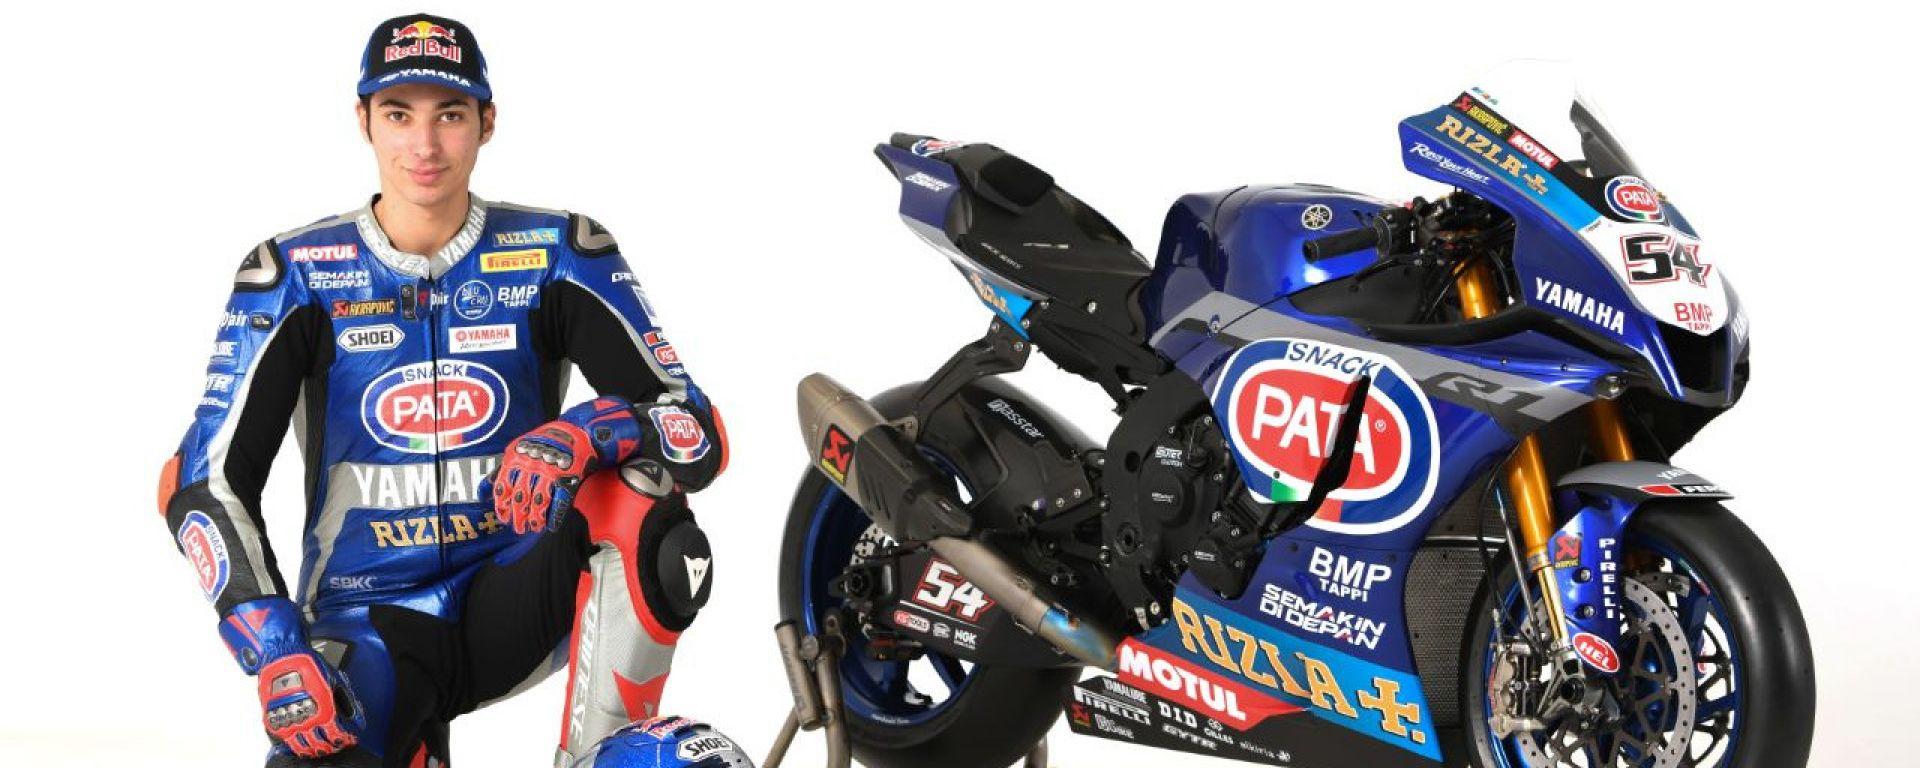 World Superbike 2020, Toprak Razgatlioglu (Yamaha)